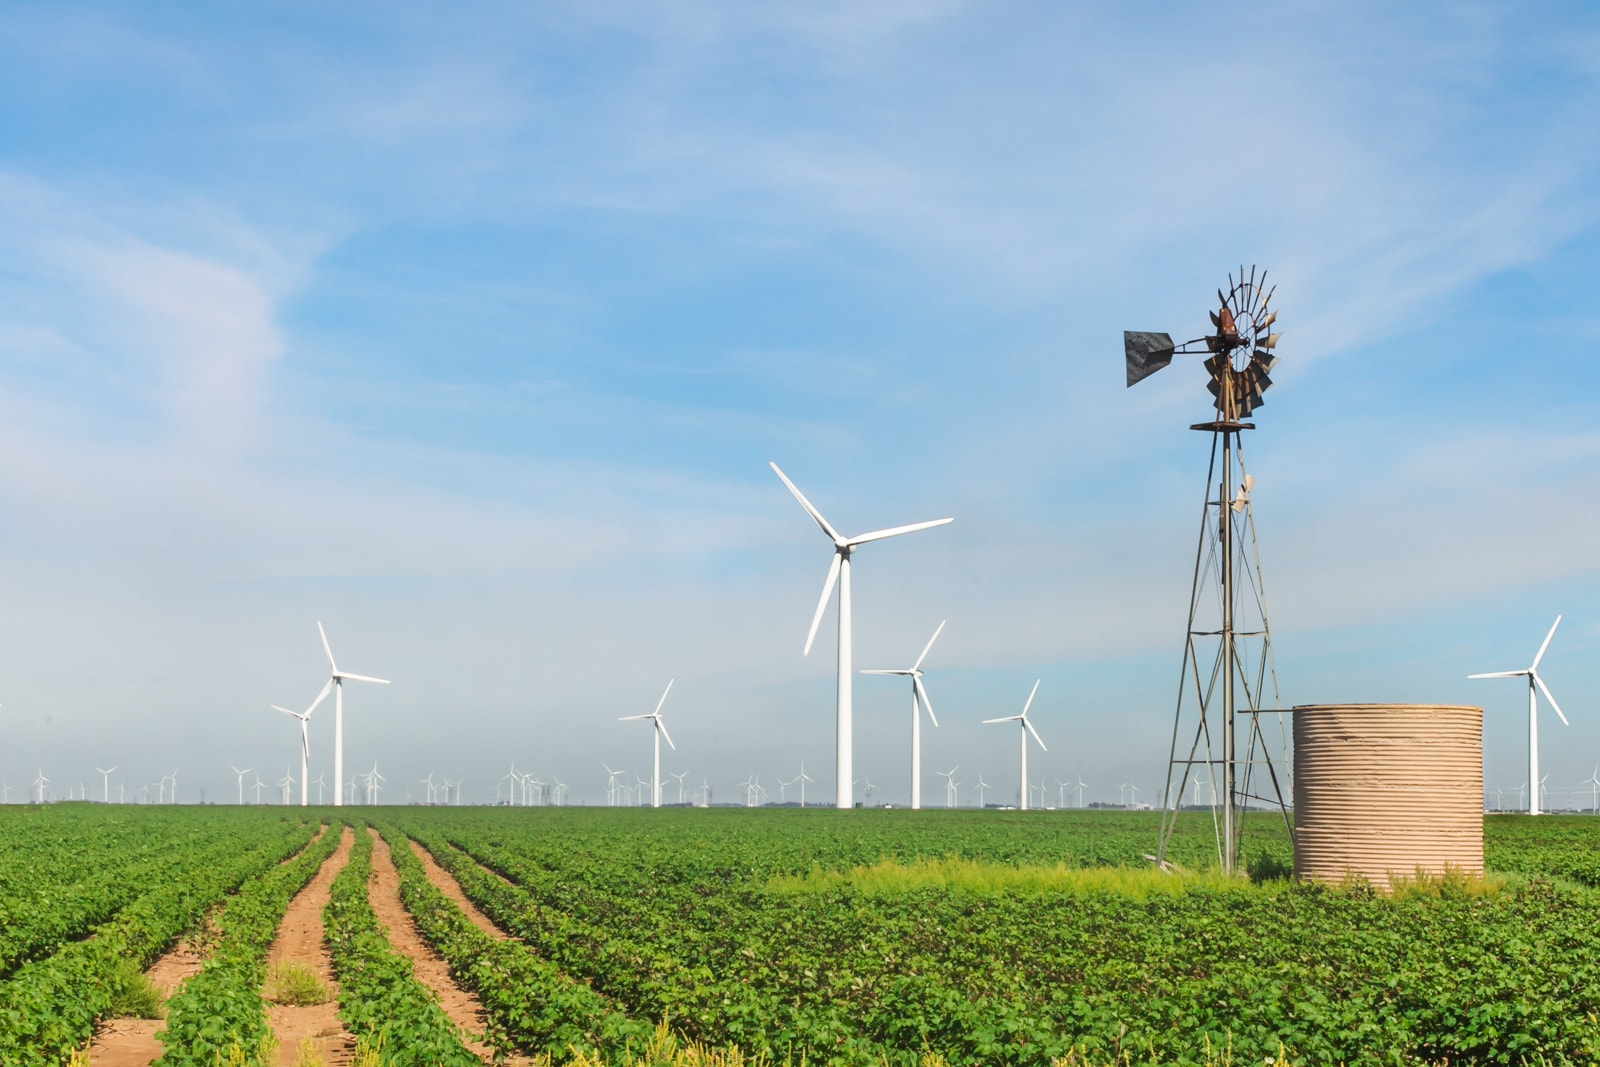 Roscoe Wind Farm in West Texas